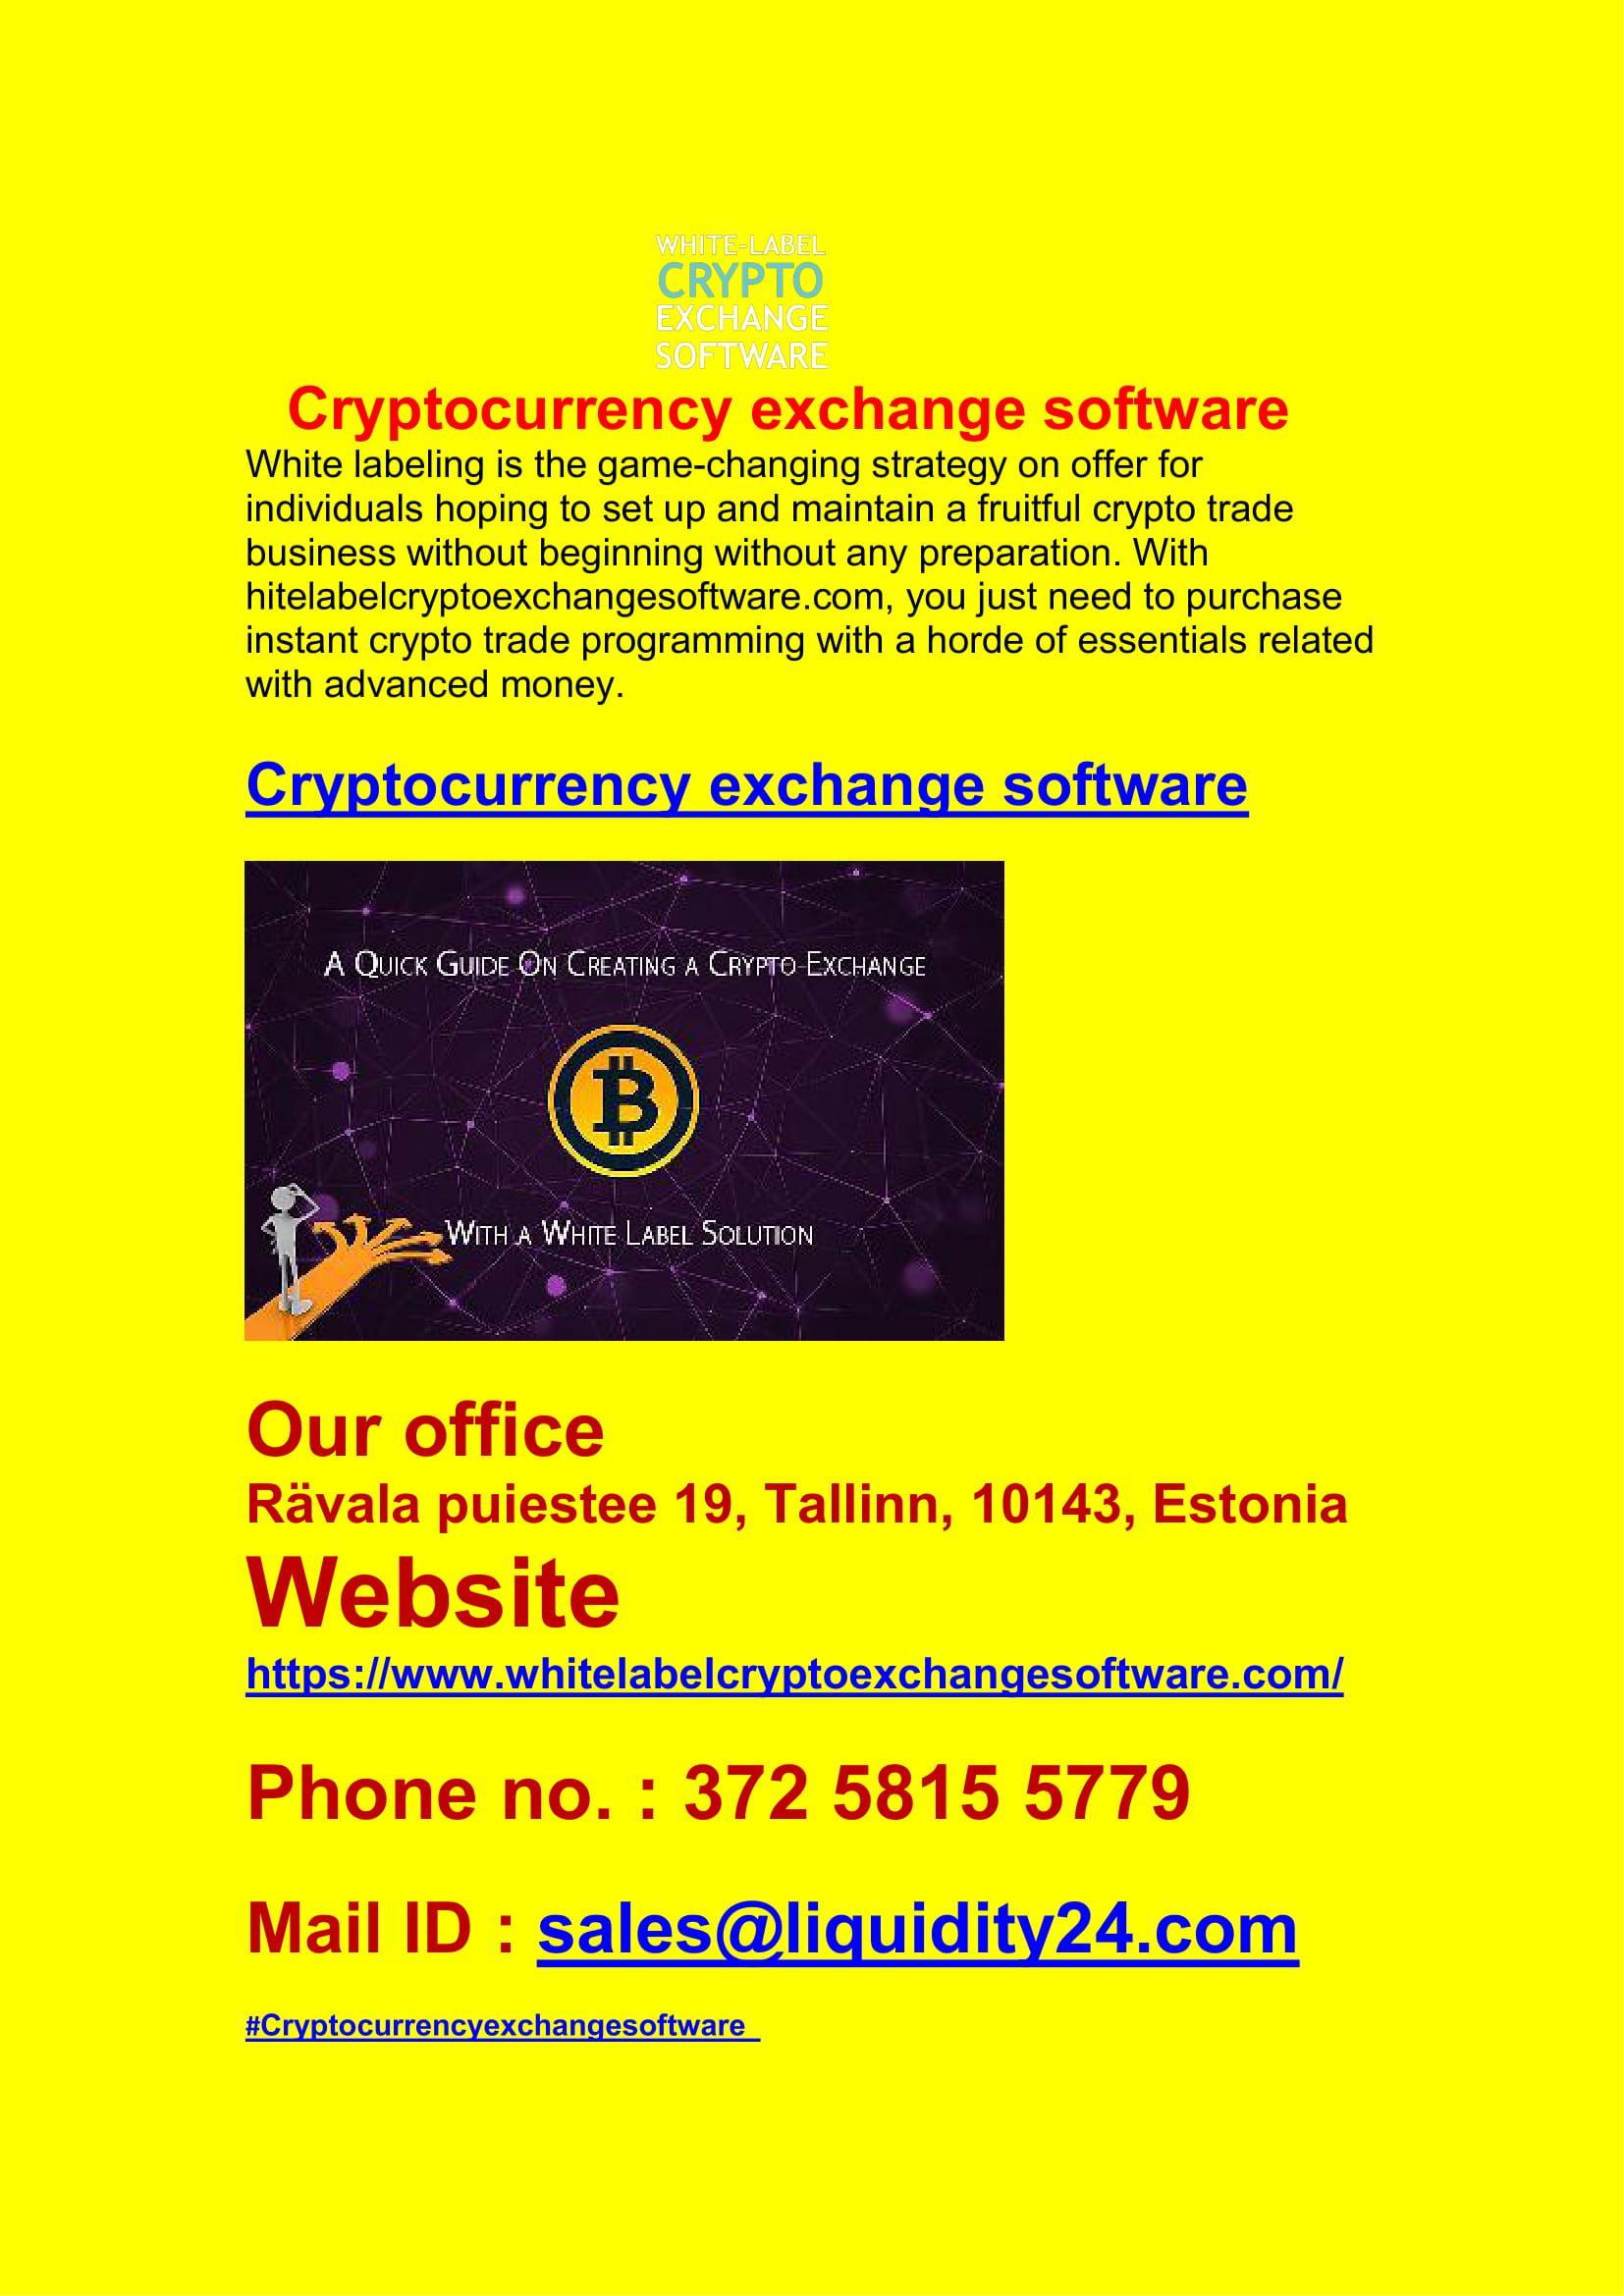 Cryptocurrency exchange software Crypto exchange